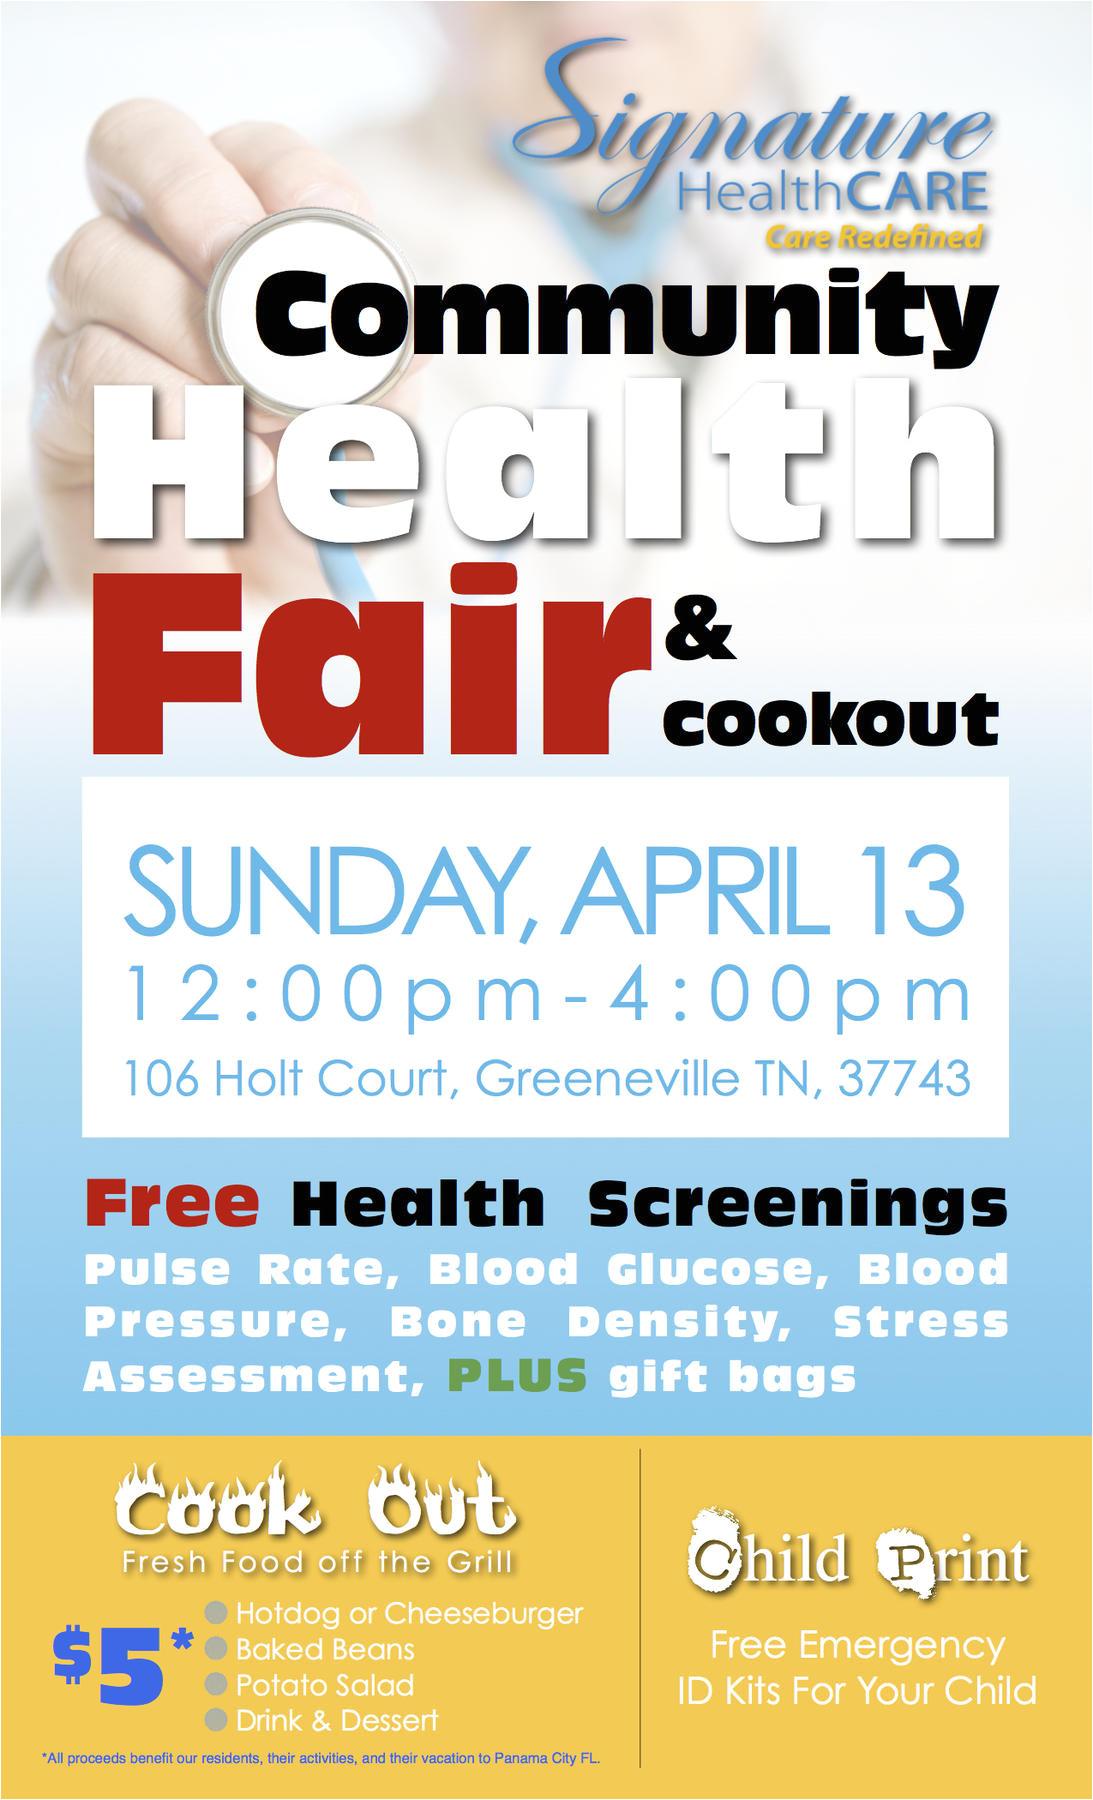 shc to host community health fair